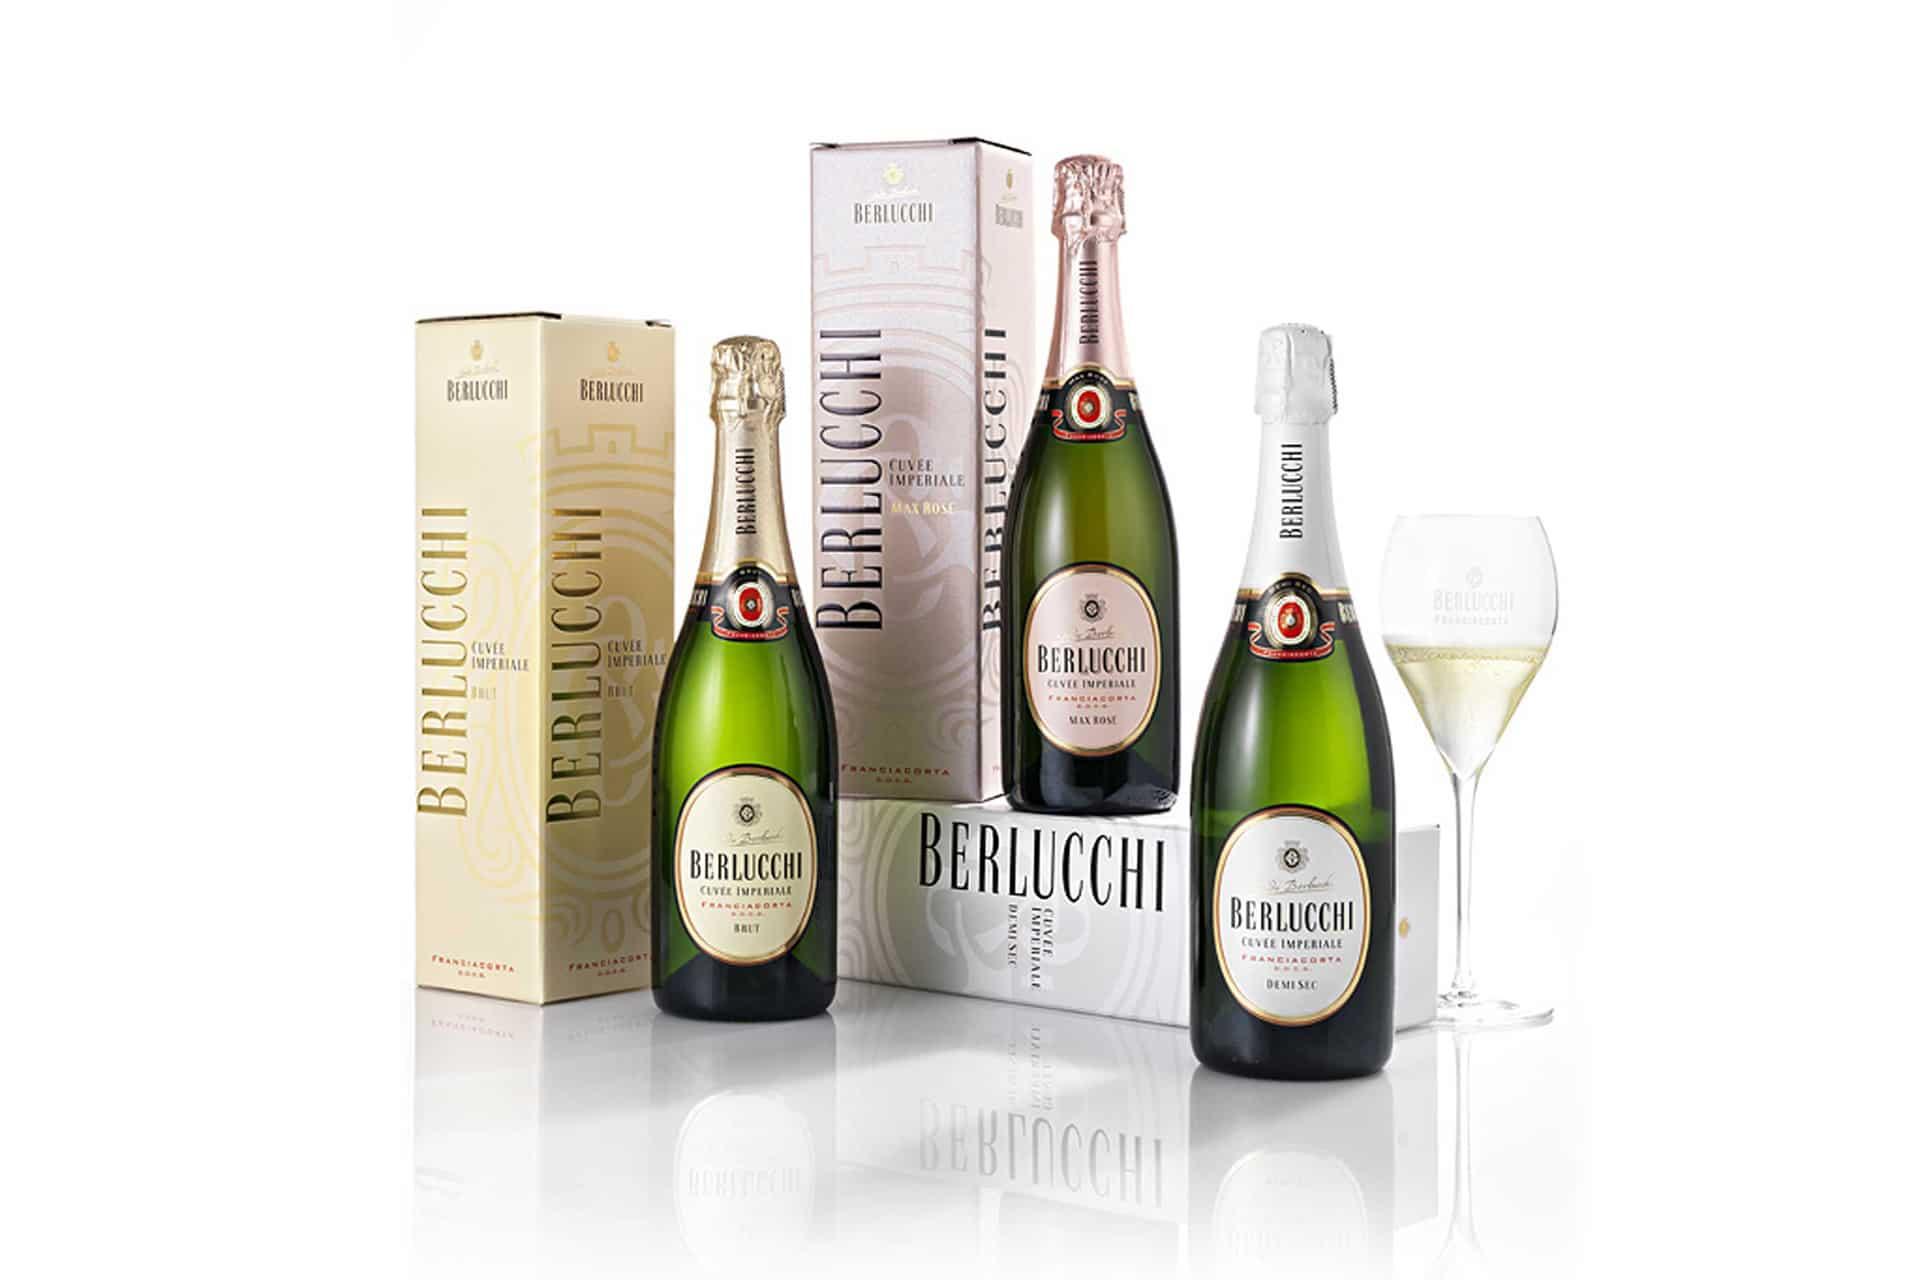 Guido Berlucchi vino